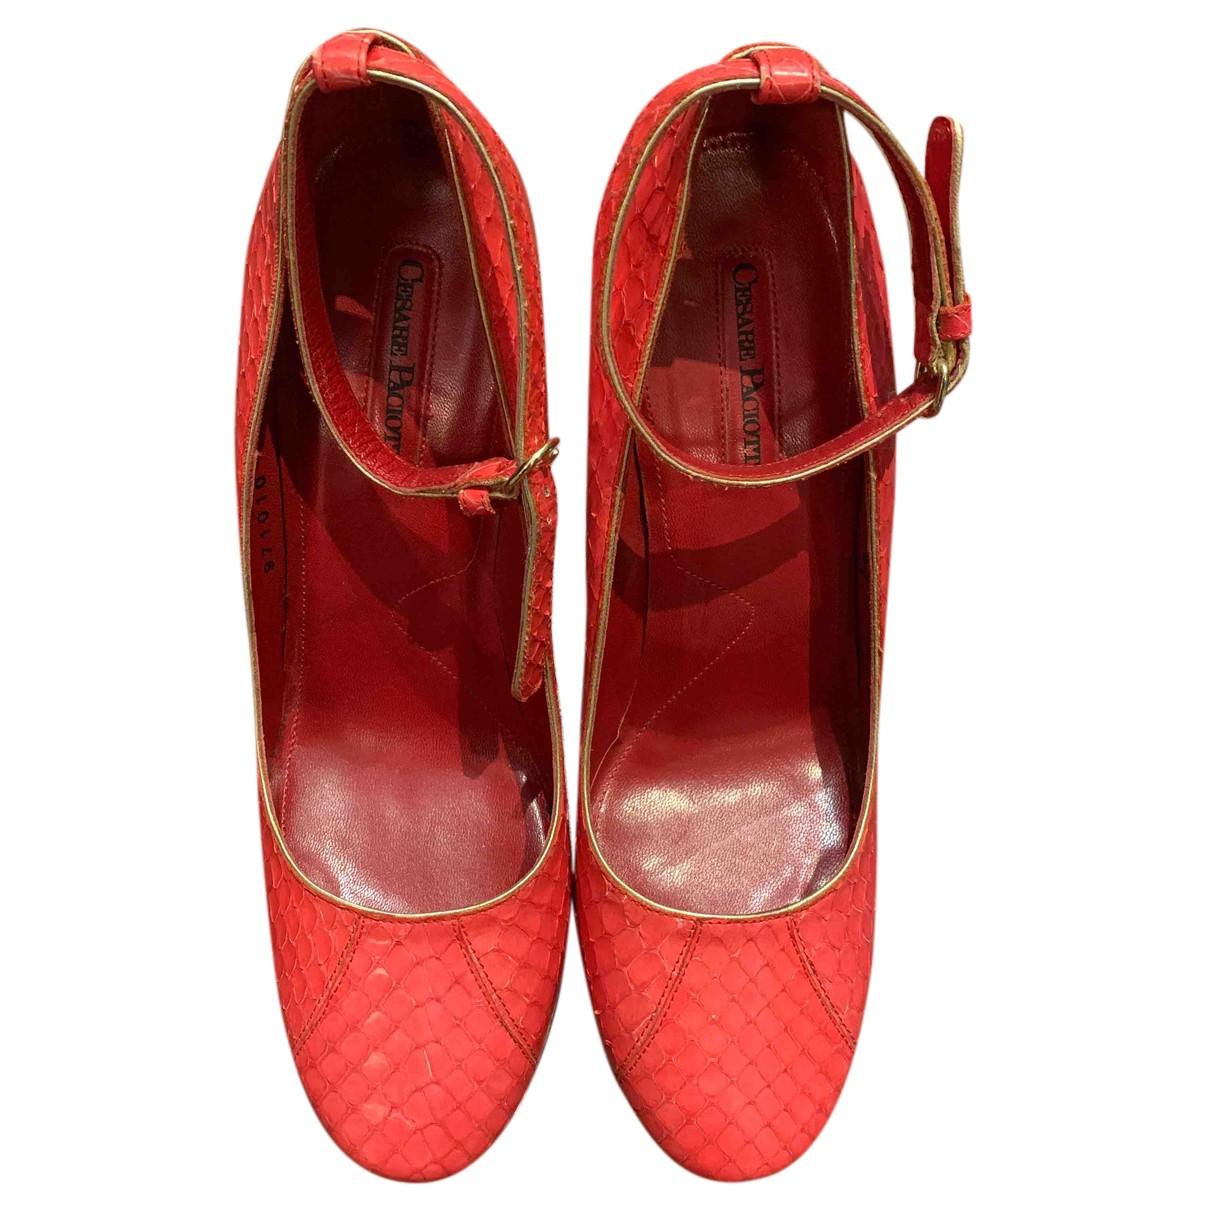 Cesare Paciotti N Exotic leathers Sandals for Women 37 EU